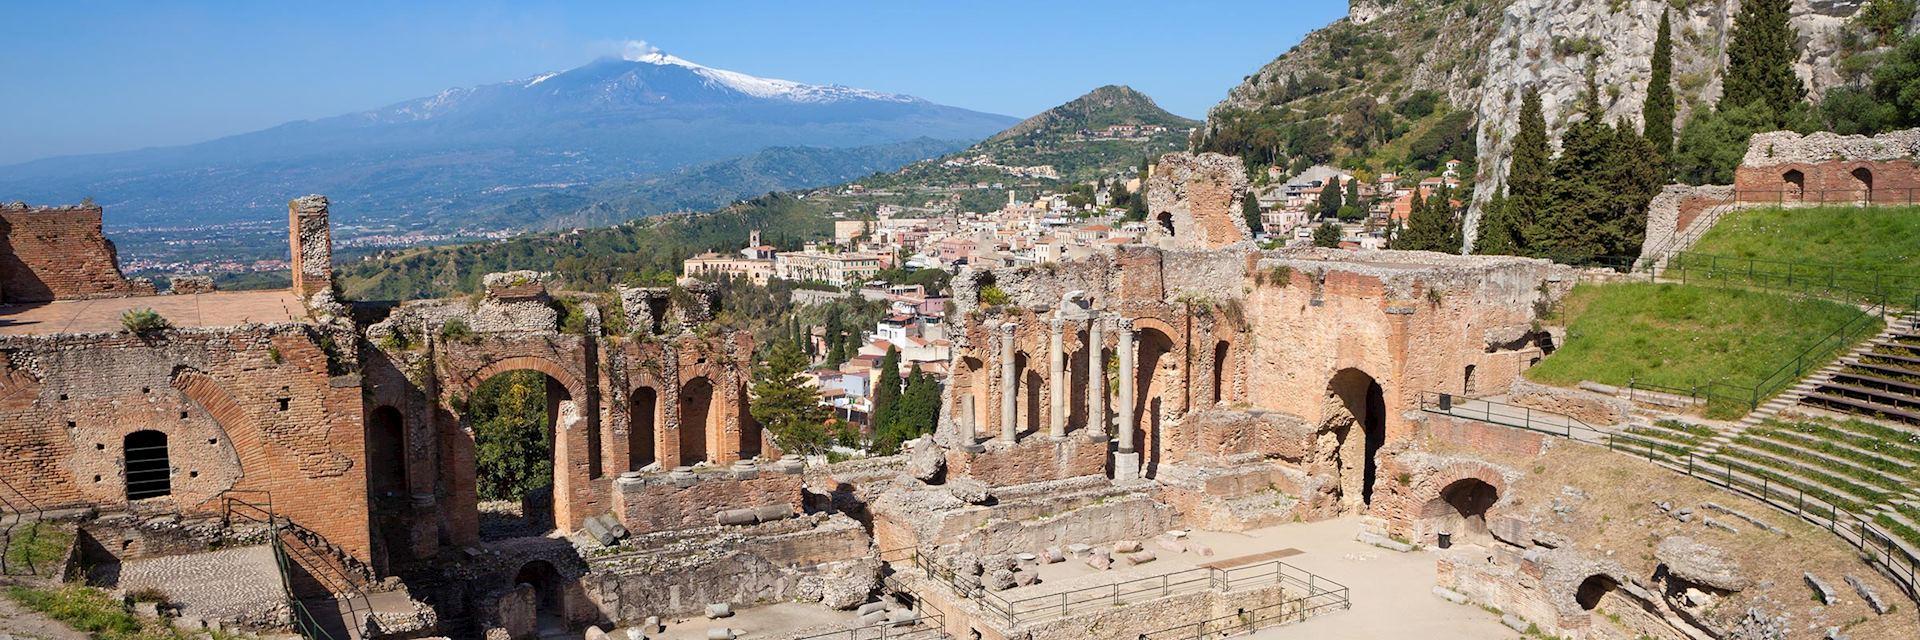 Teatro Greco,Taormina